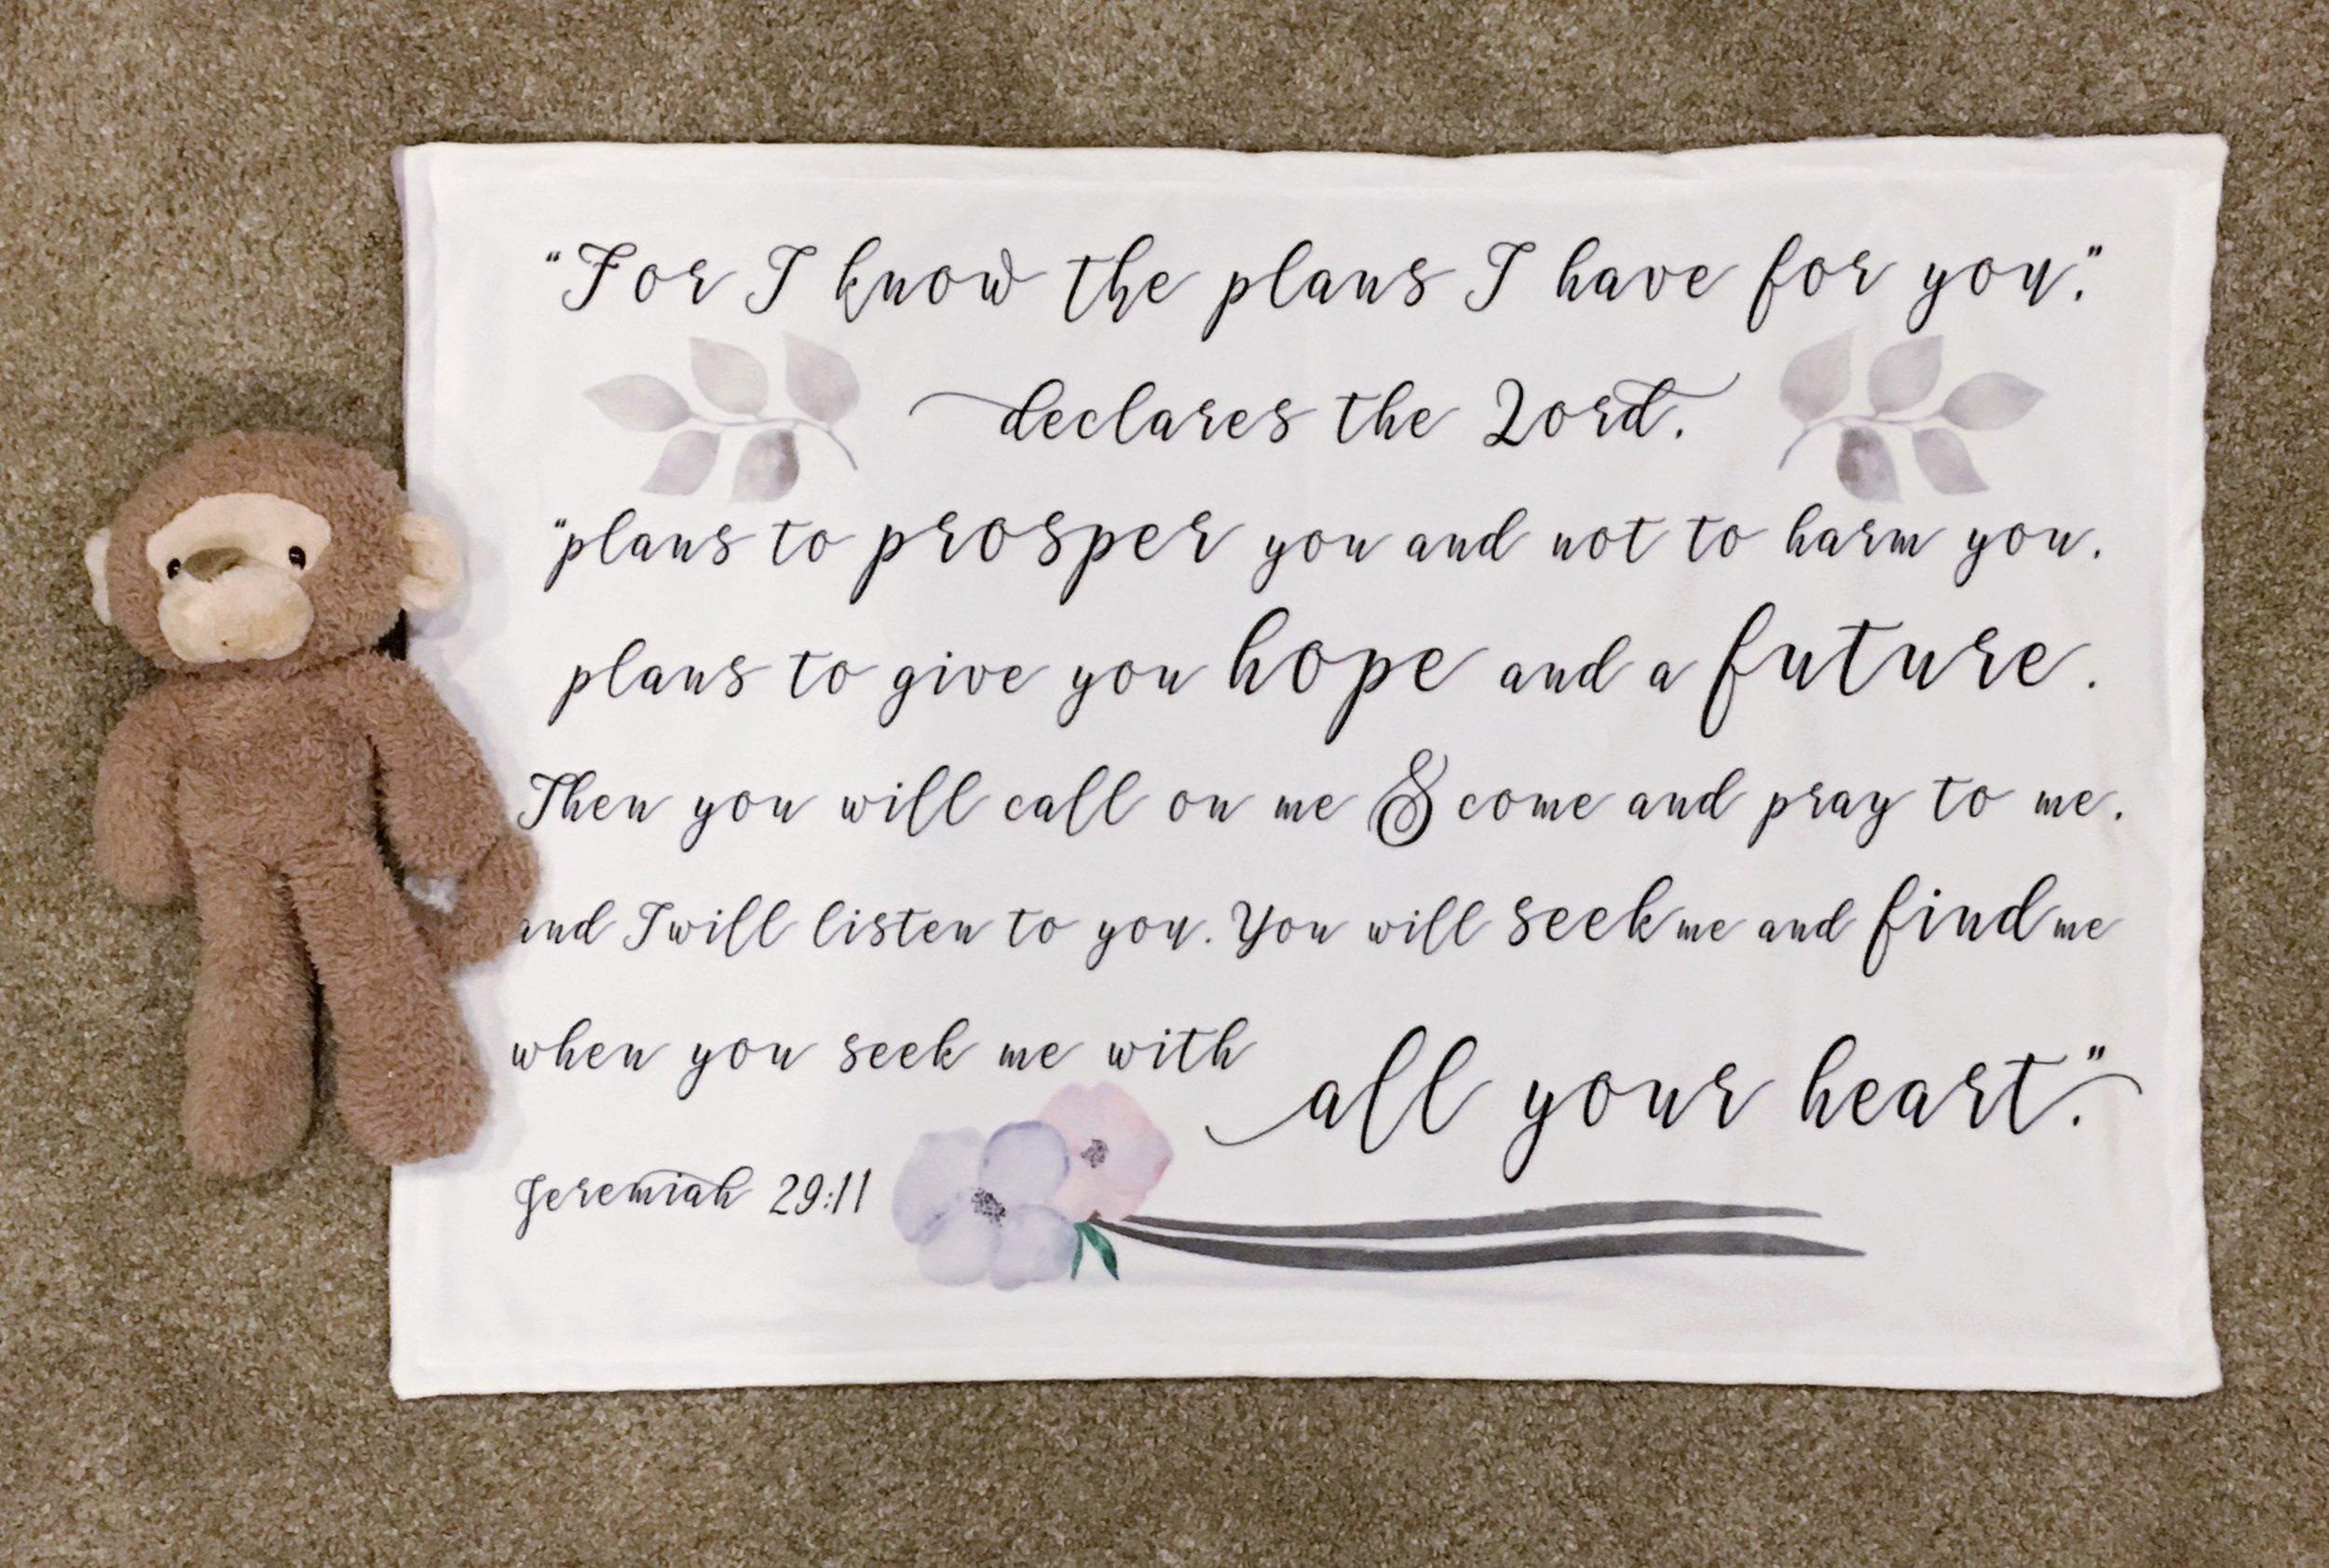 Central PA, Baby Blanket, Hand lettered, JesSmith Designs, Invitations, custom-04-15 06.22.57.jpg